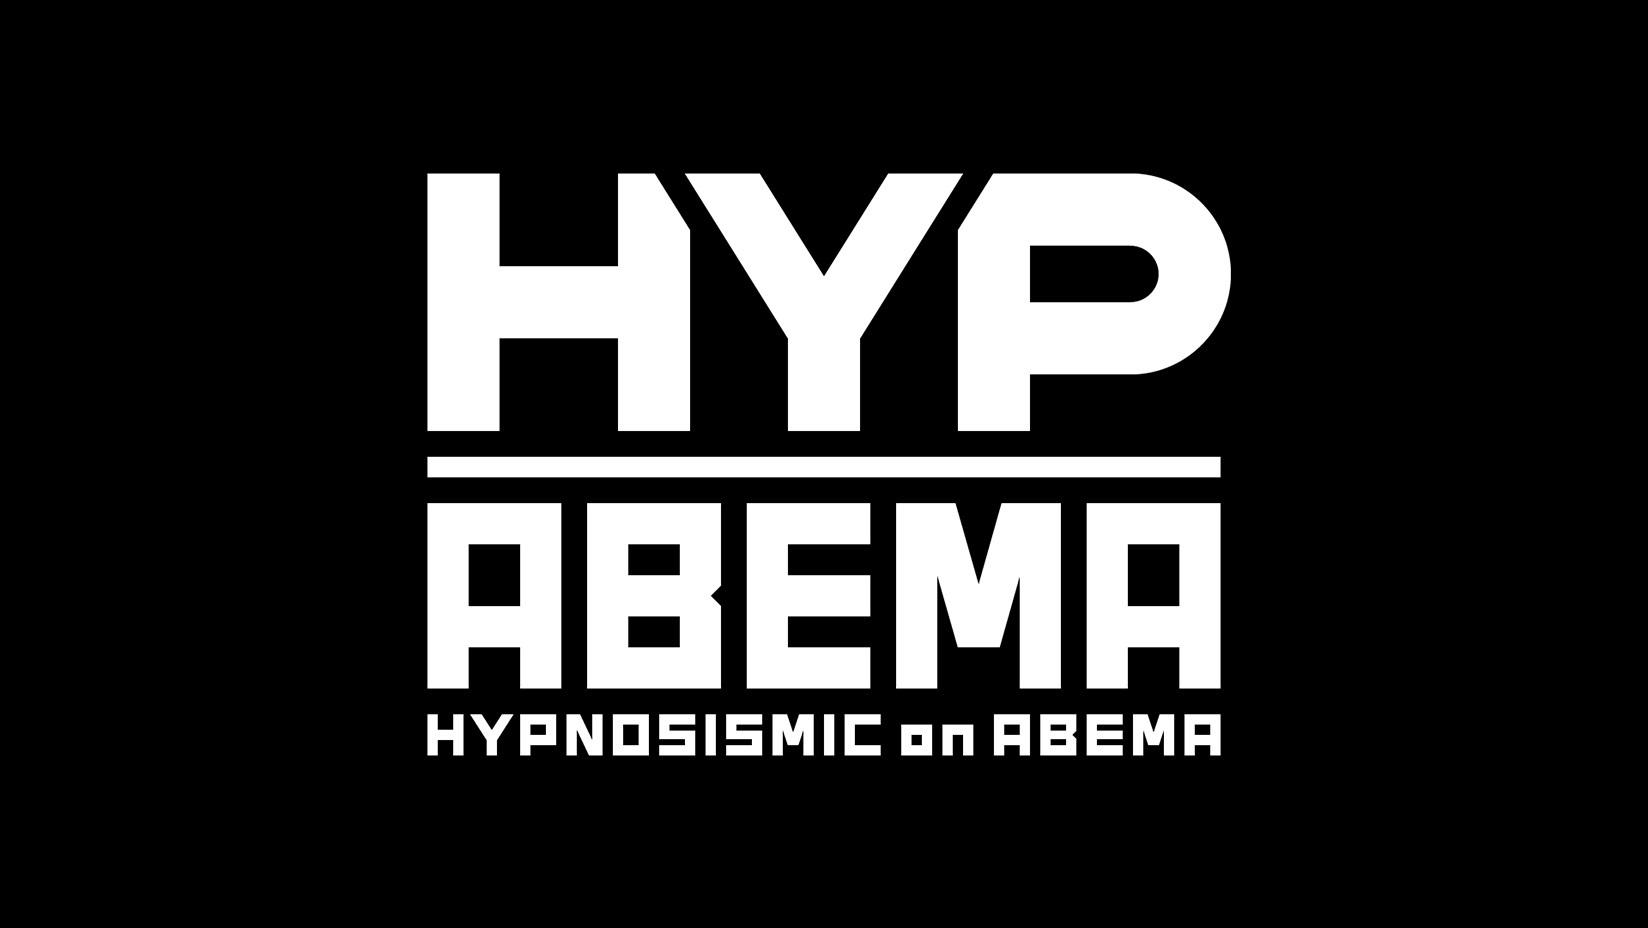 「ABEMA」×『ヒプマイ』コラボ『HYPNOSISMIC on ABEMA』ロゴ (C)AbemaTV,Inc. (c) King Record Co., Ltd. All rights reserved.